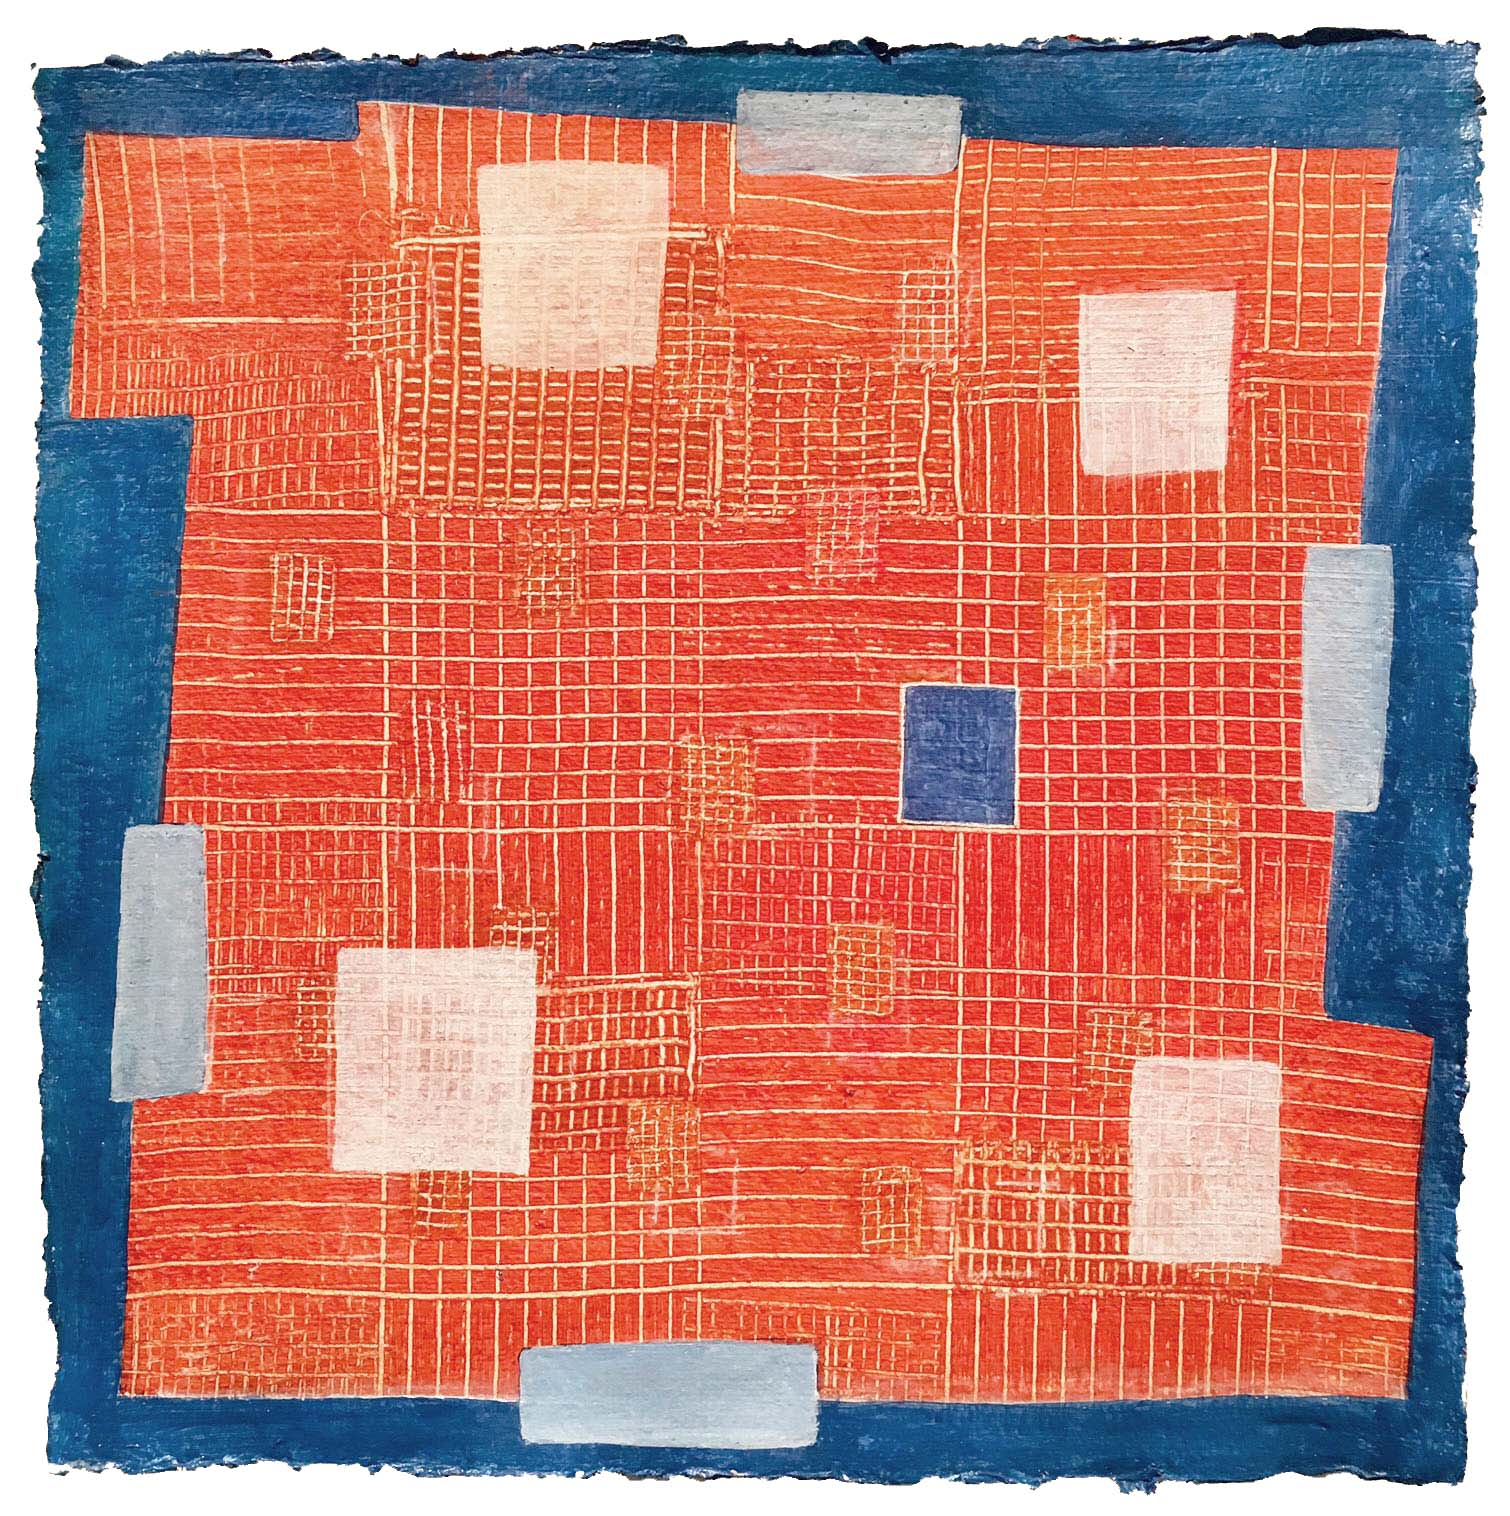 Pueblo   12 x 12 inches Acrylic on Paper 2016